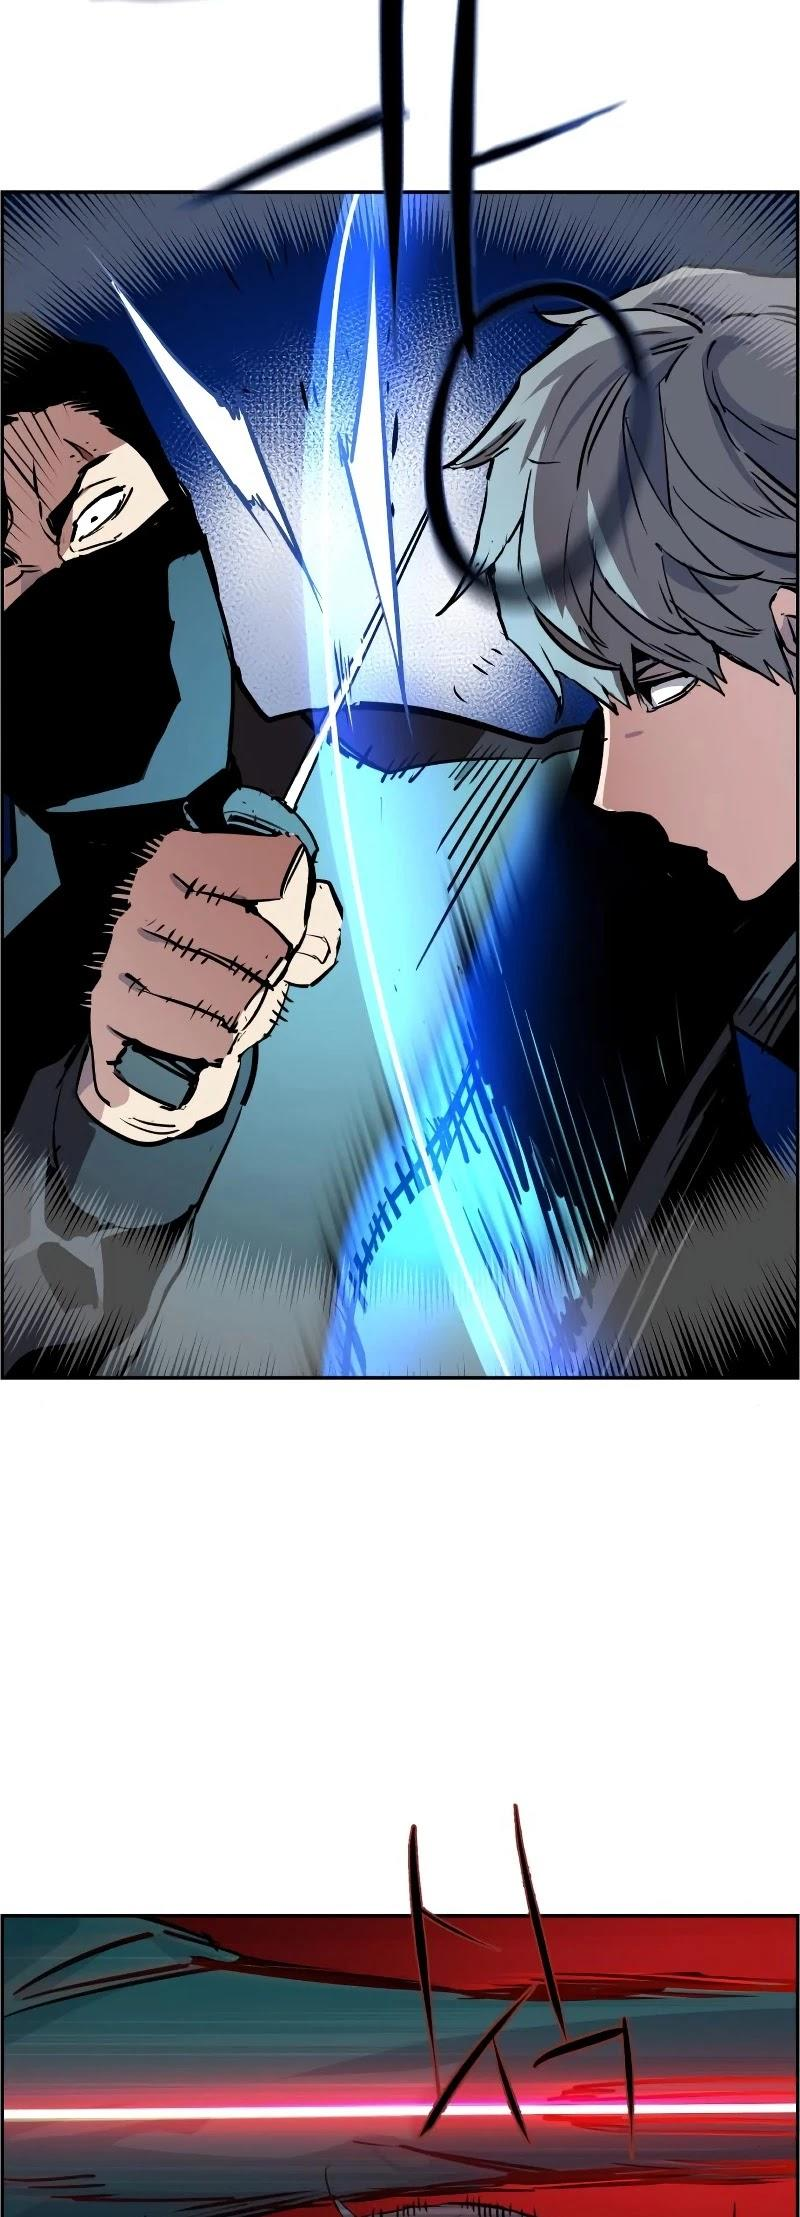 Mercenary Enrollment Chapter 47 page 19 - Mangakakalot